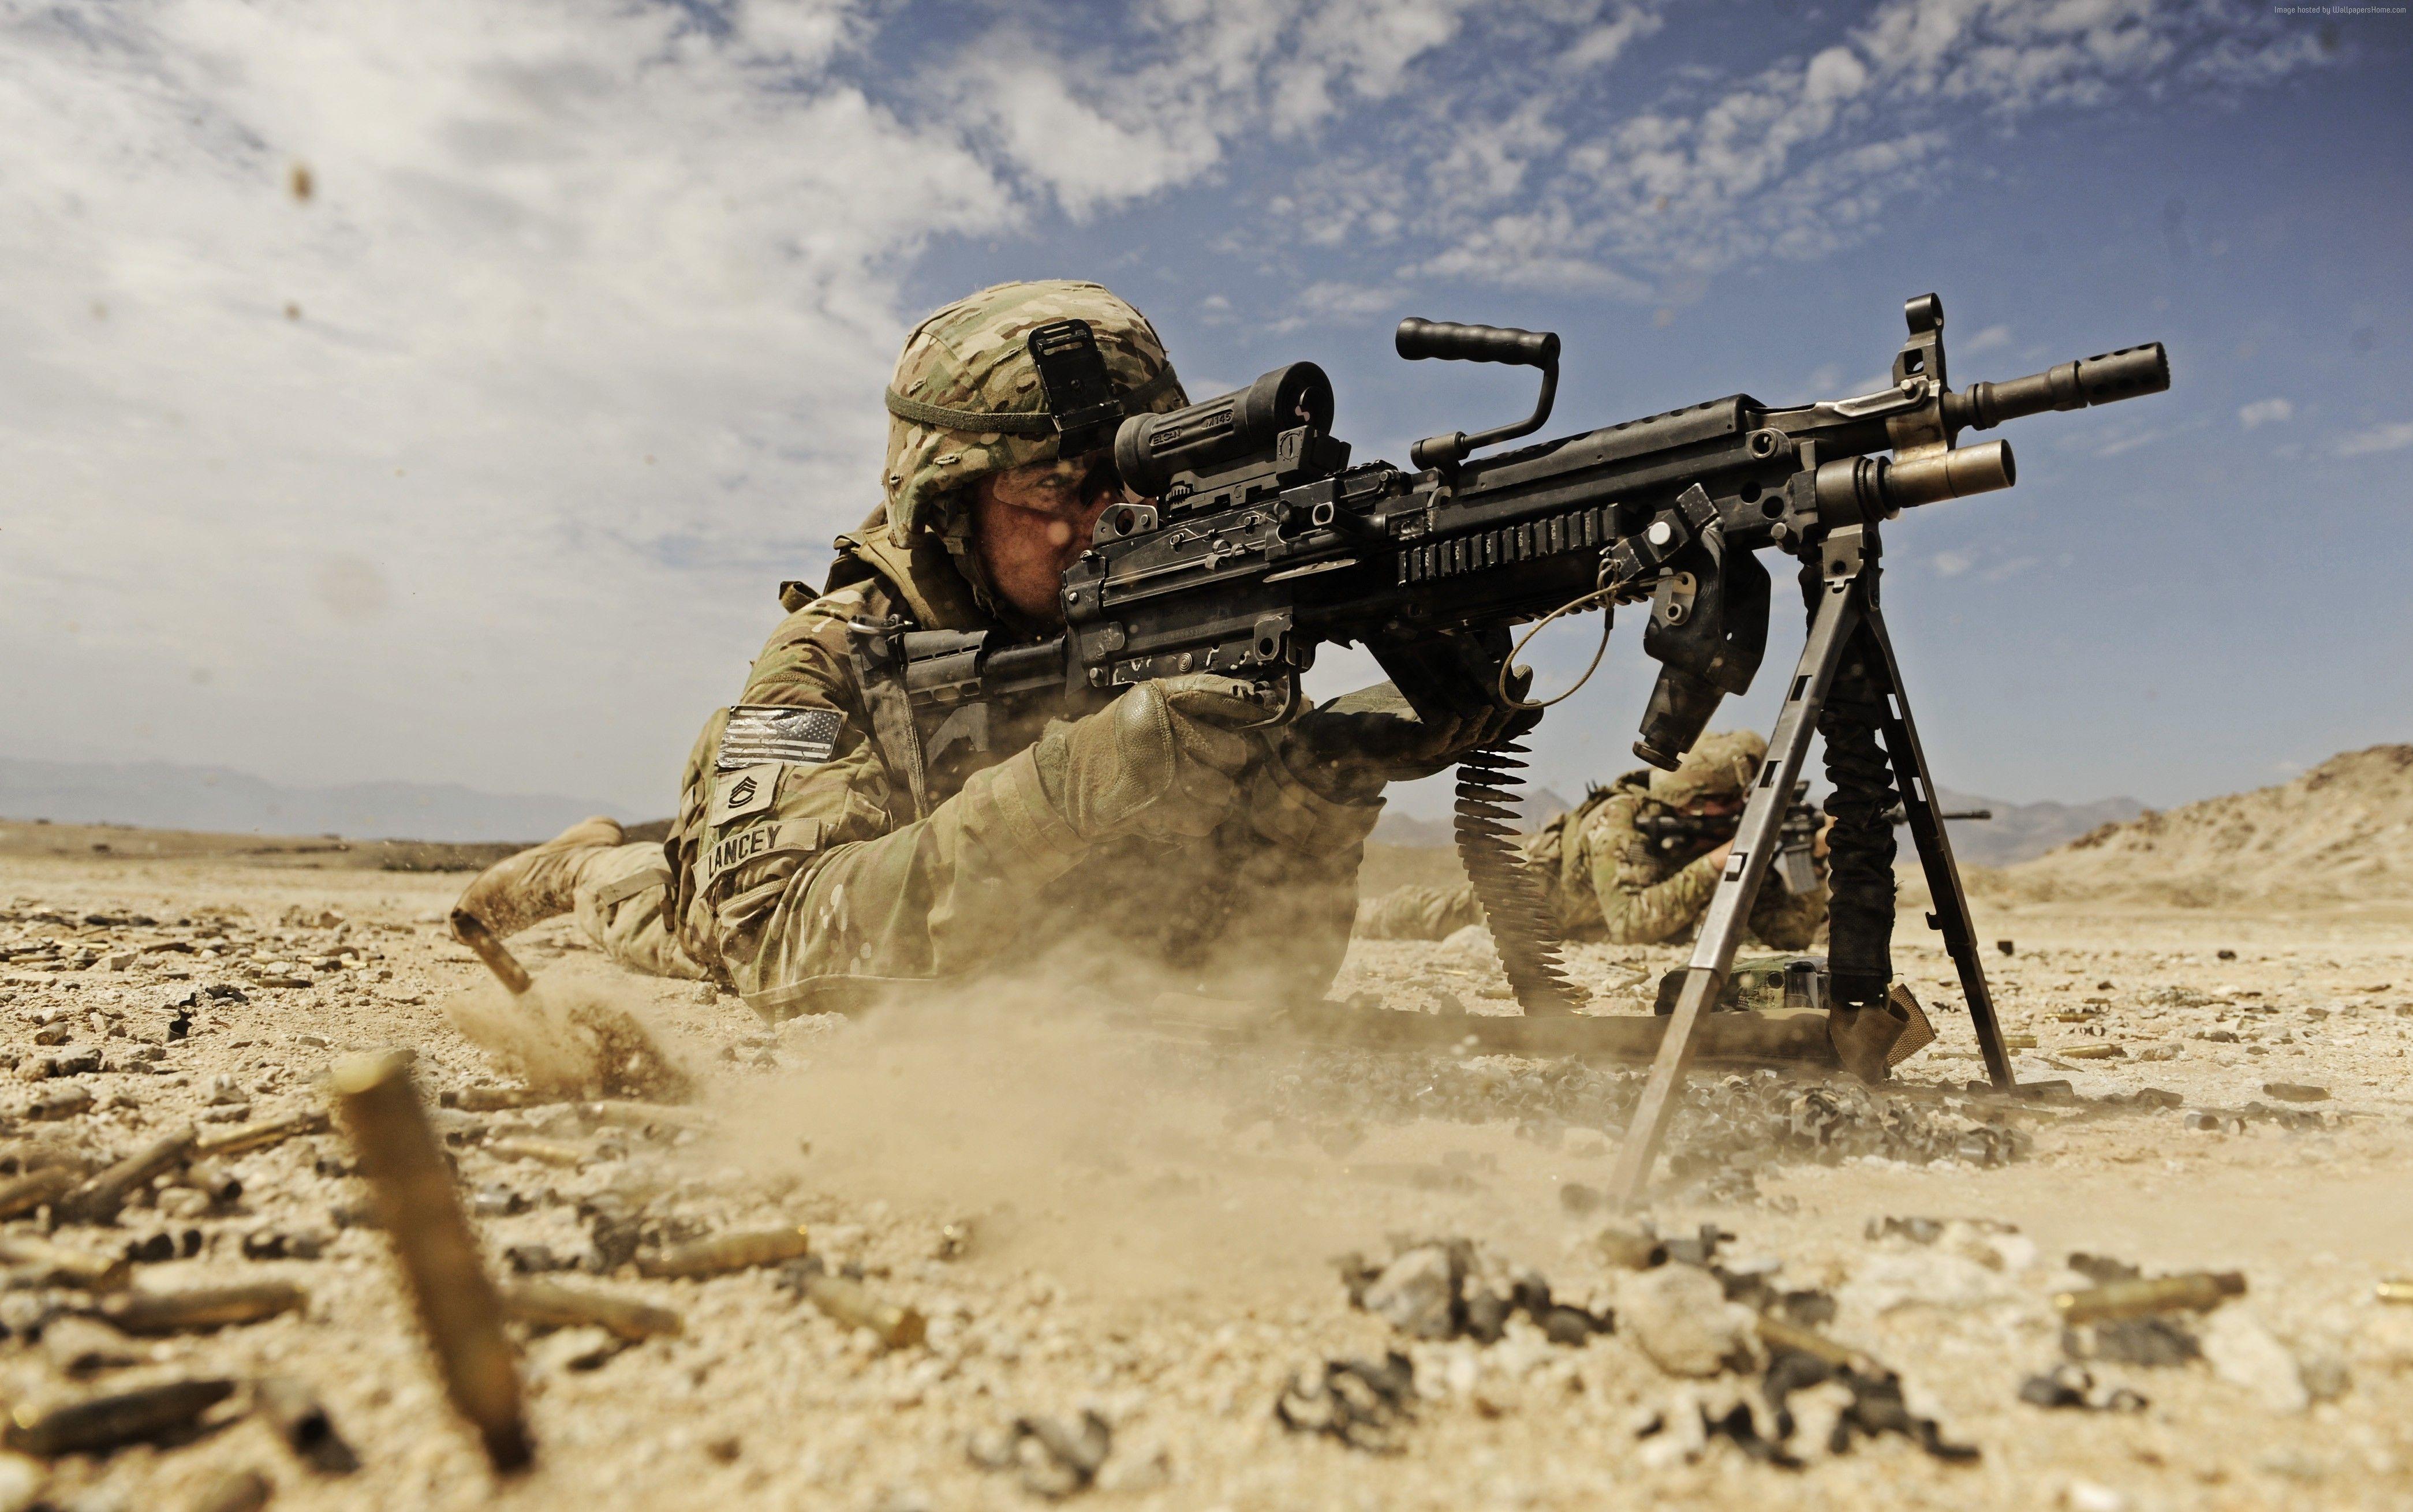 Machine Gun Wallpapers Top Free Machine Gun Backgrounds